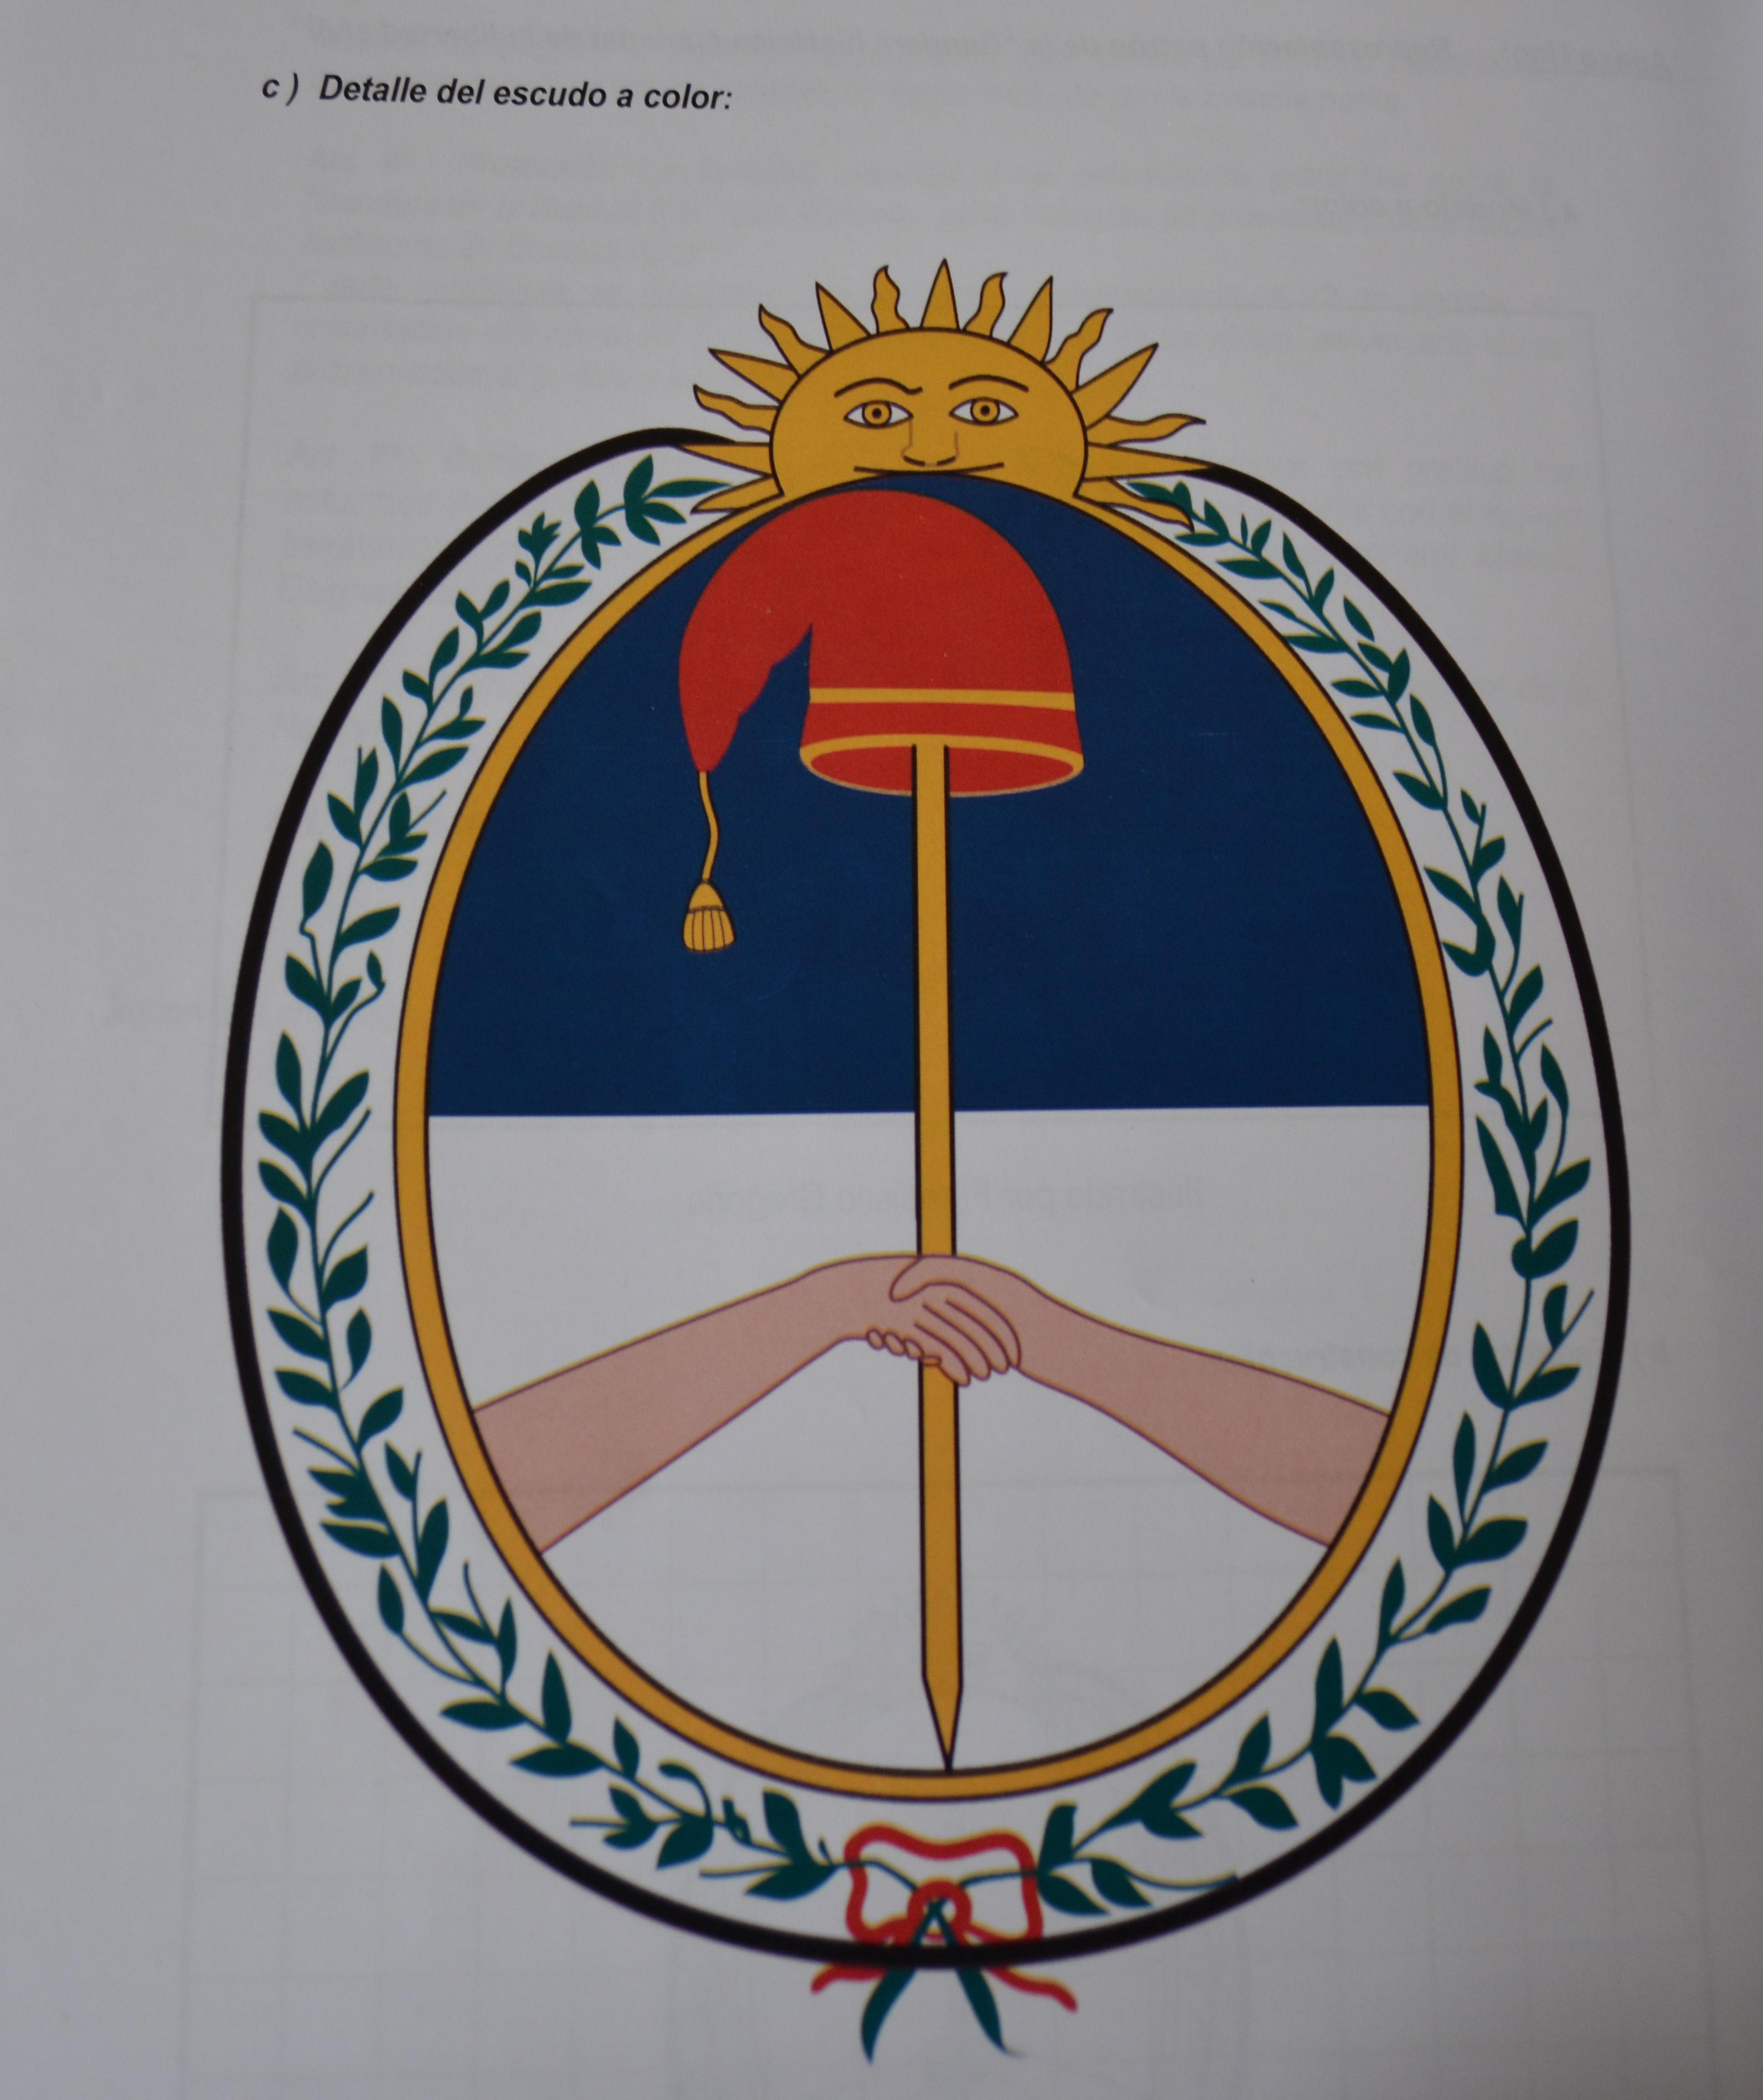 BANDERA NACIONAL DE NUESTRA LIBERTAD CIVIL – Ministerio de Educacion